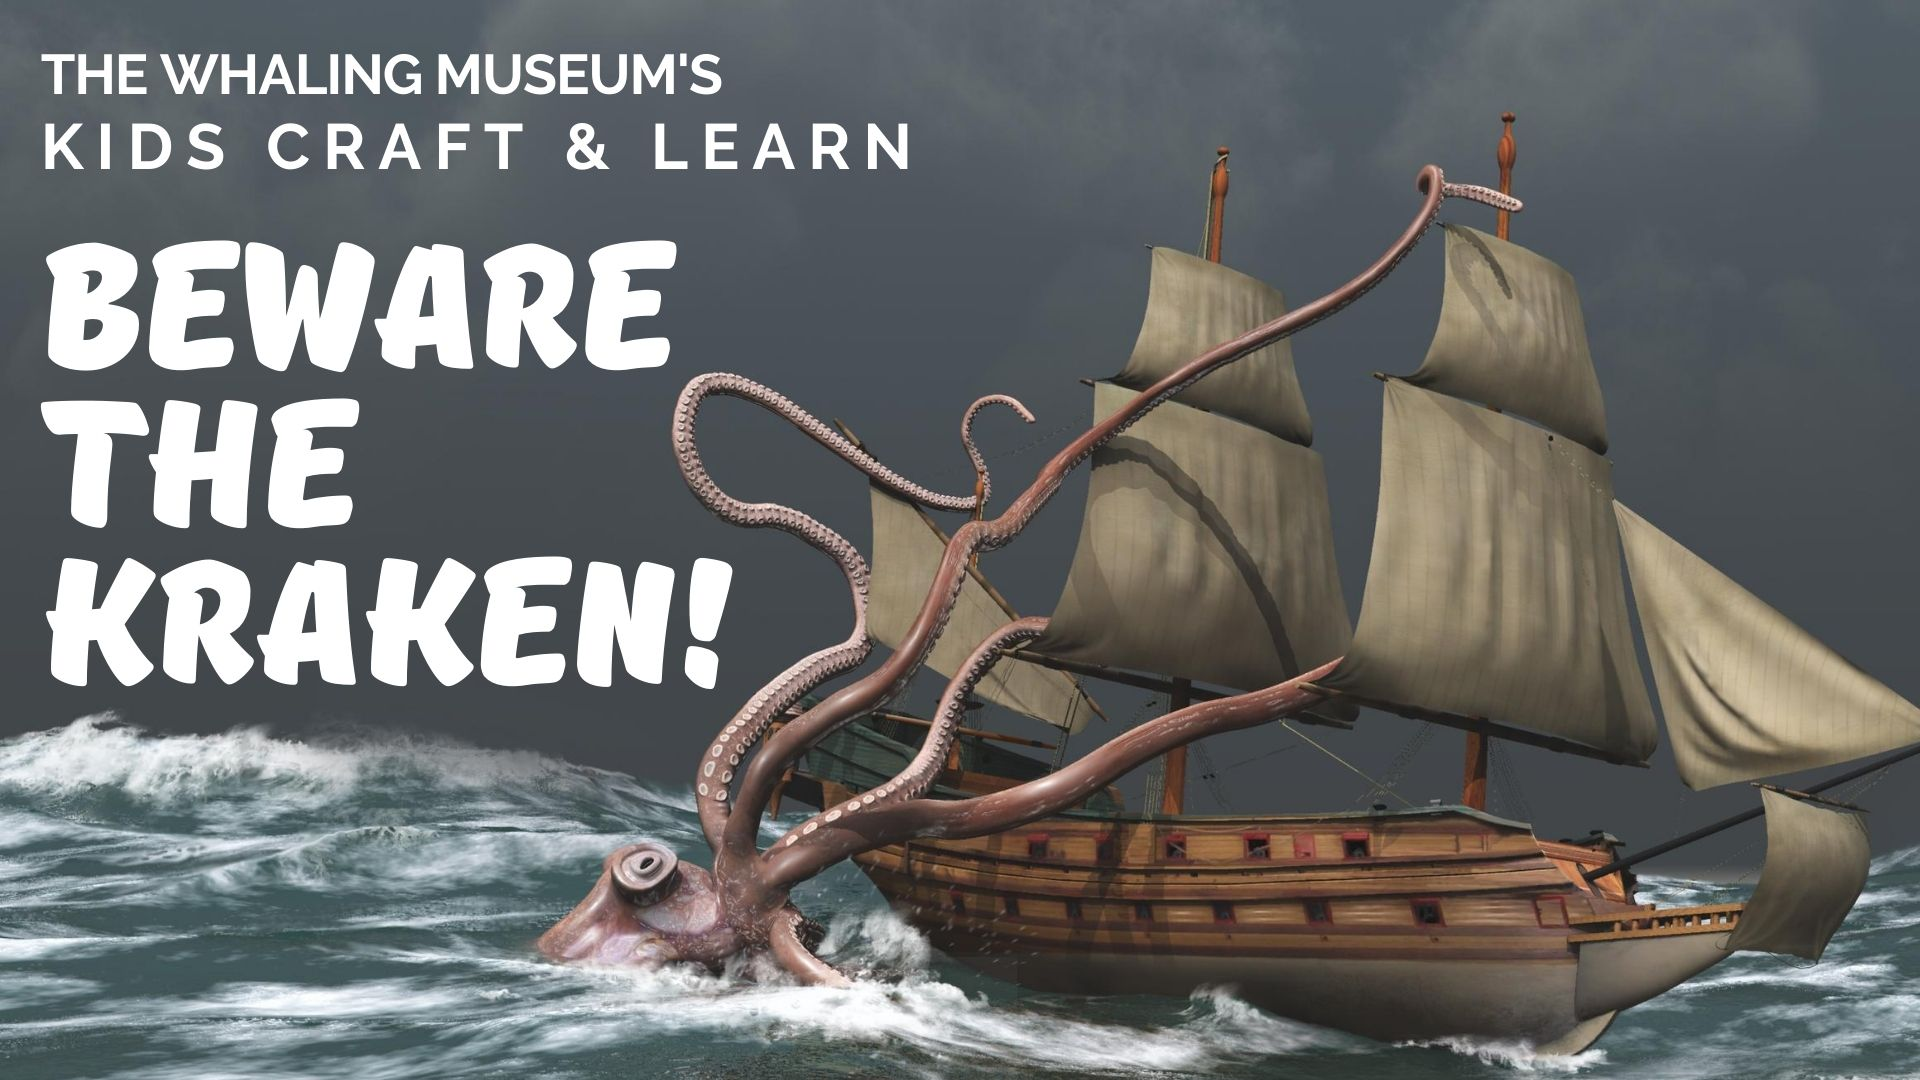 ONLINE Beware the Kraken Virtual Craft Workshop at The Whaling Museum & Education Center